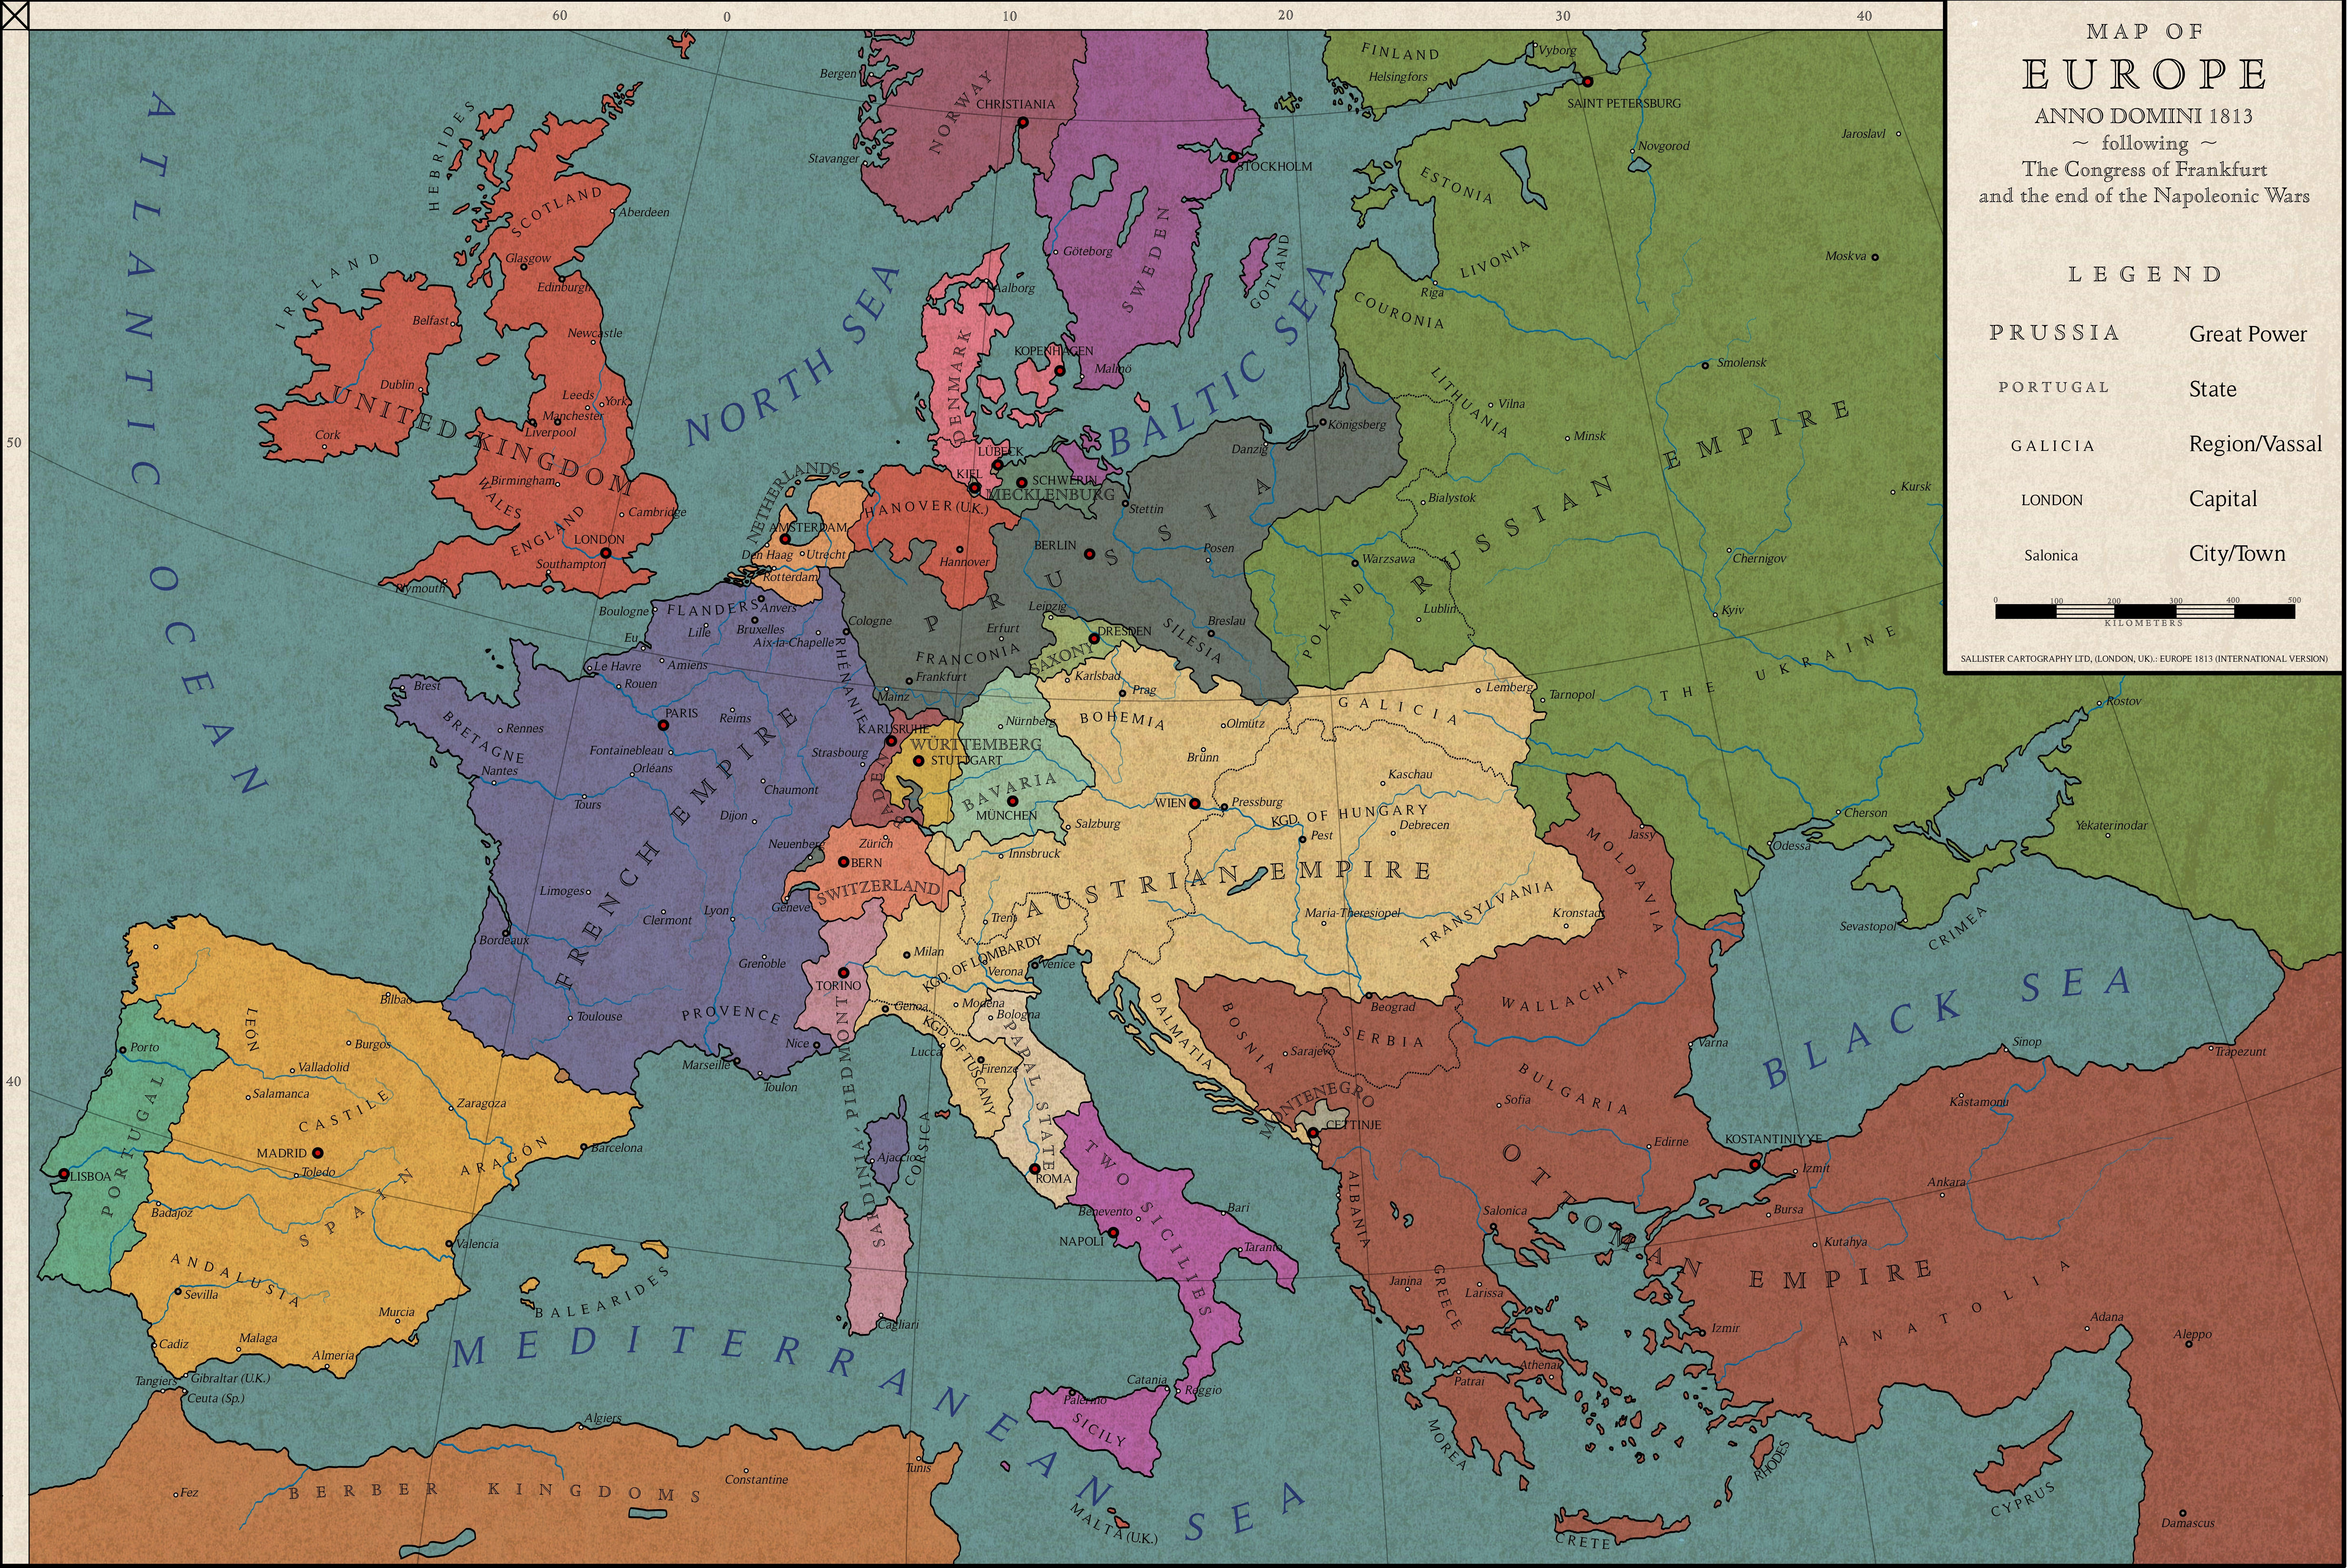 Frankfurt Karte Europa.Europe 1813 The Congress Of Frankfurt By Saluslibertatis On